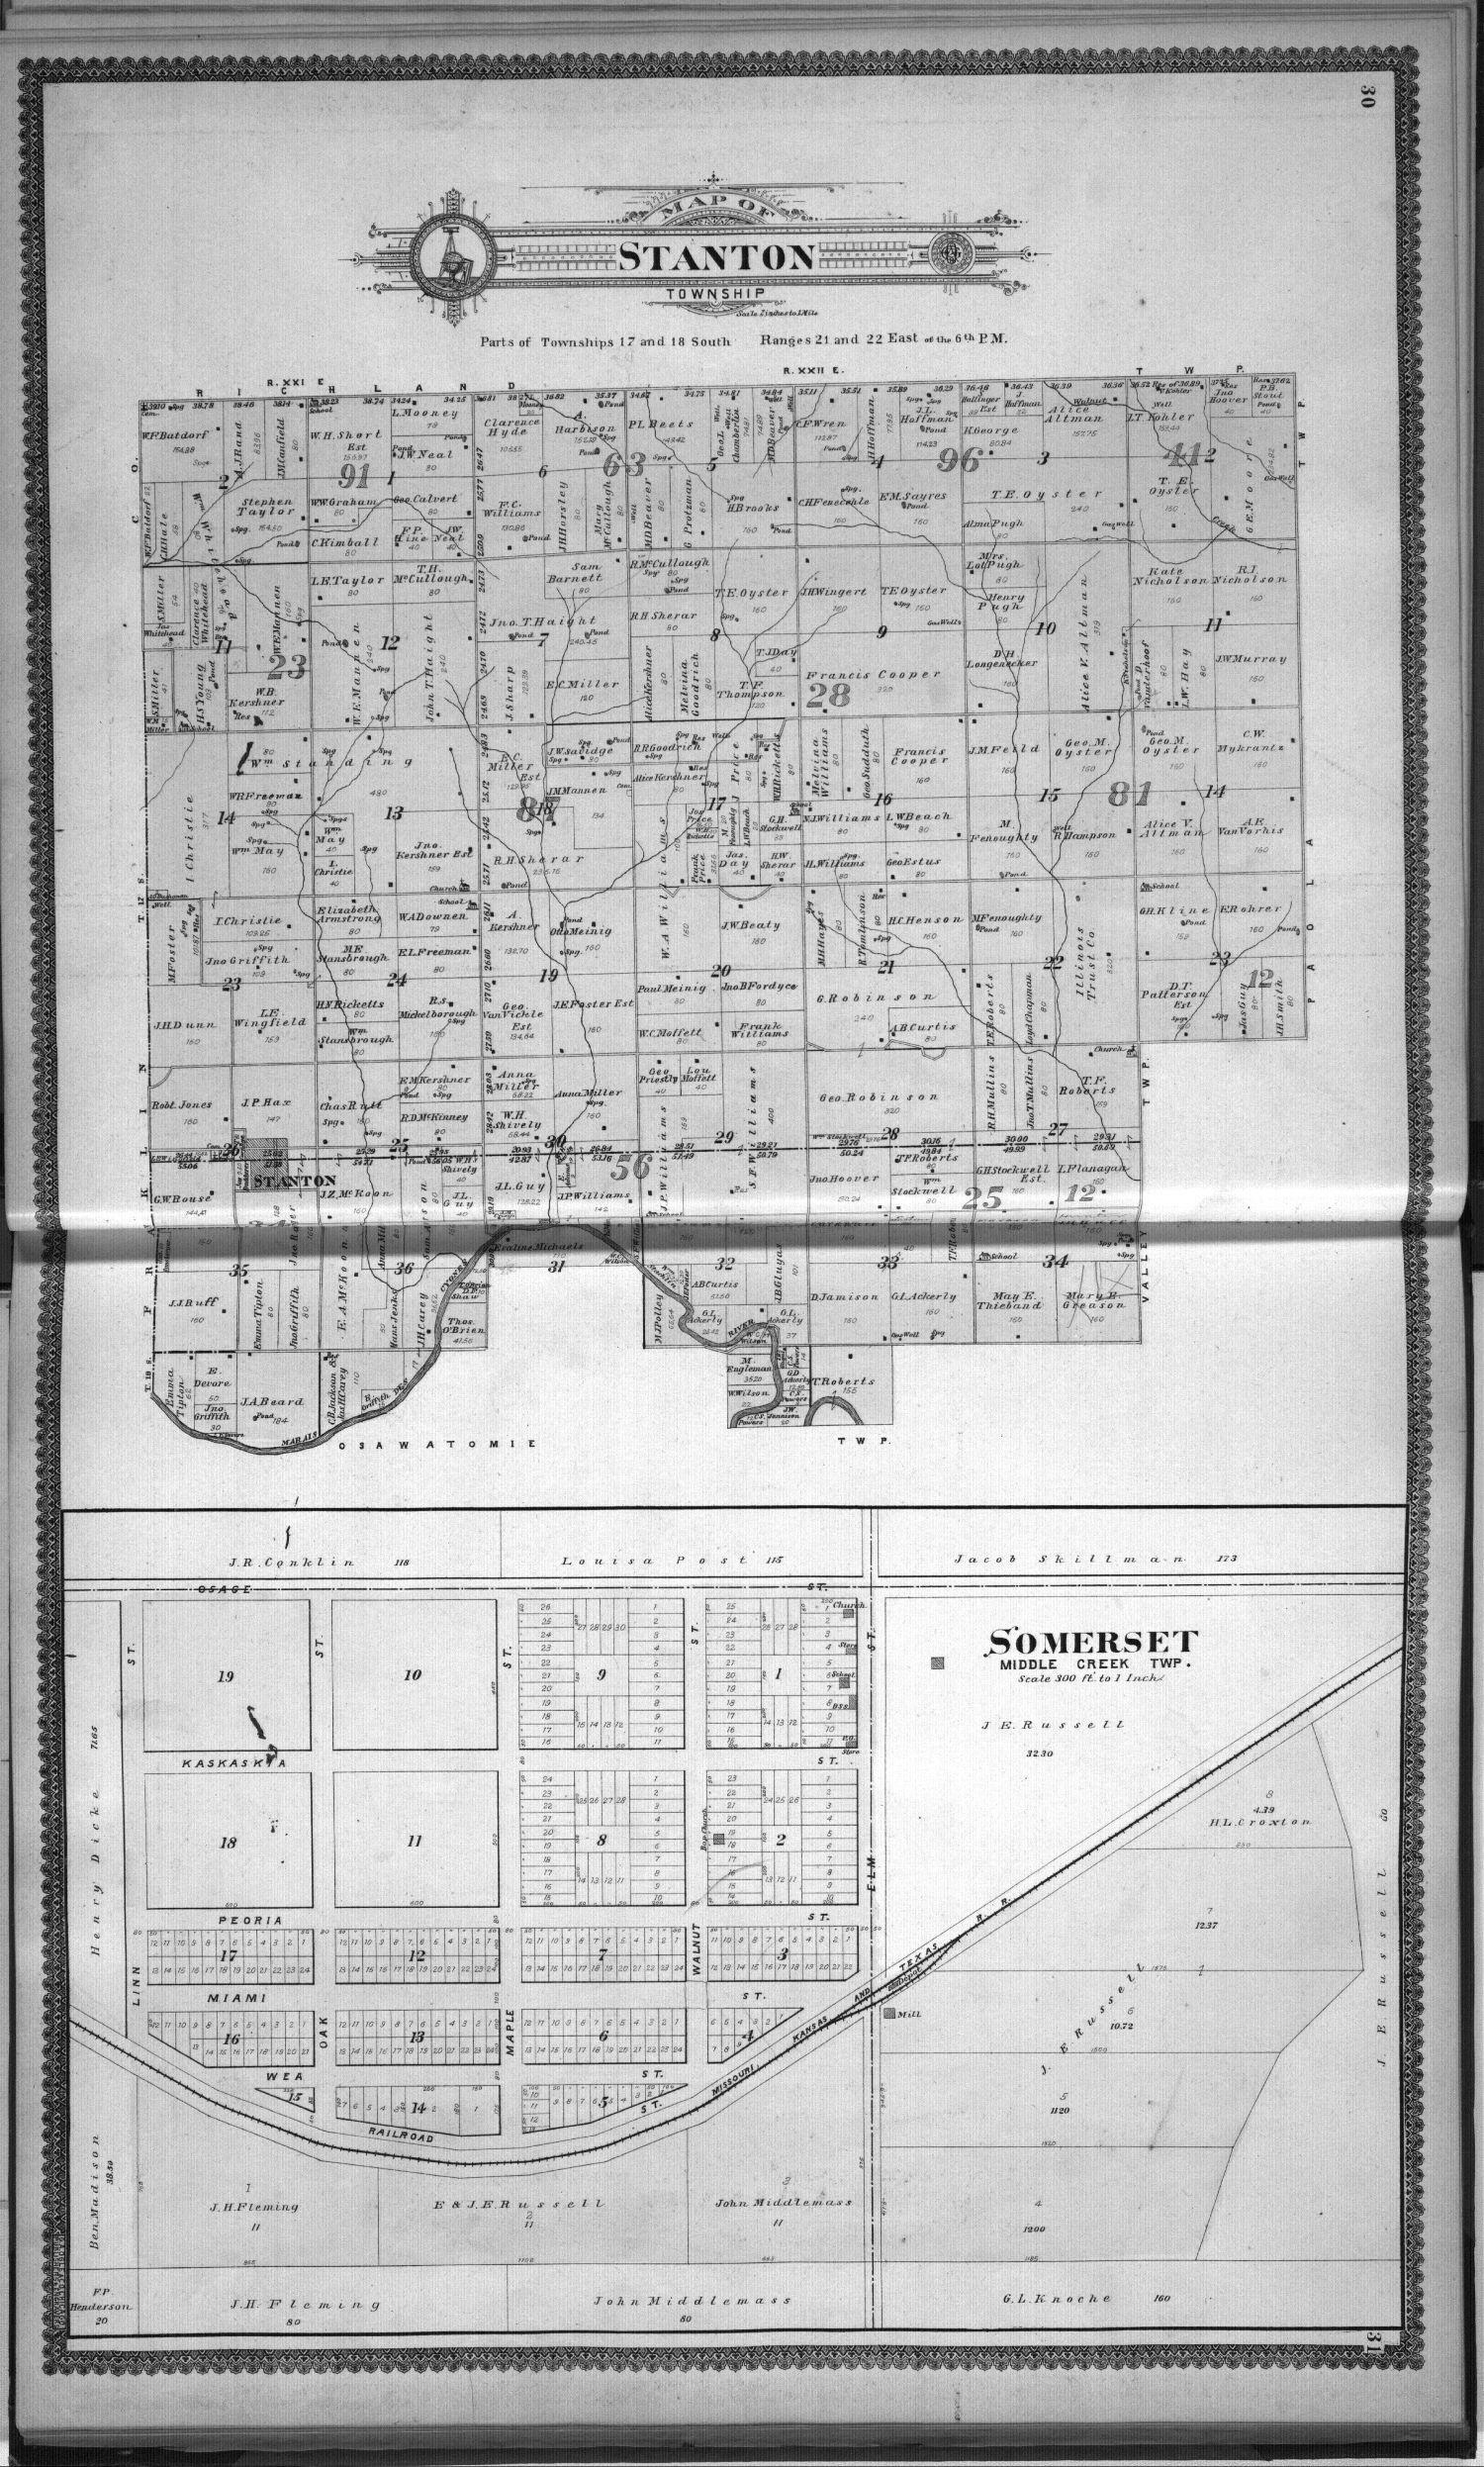 Standard atlas, Miami County, Kansas - 30 & 31